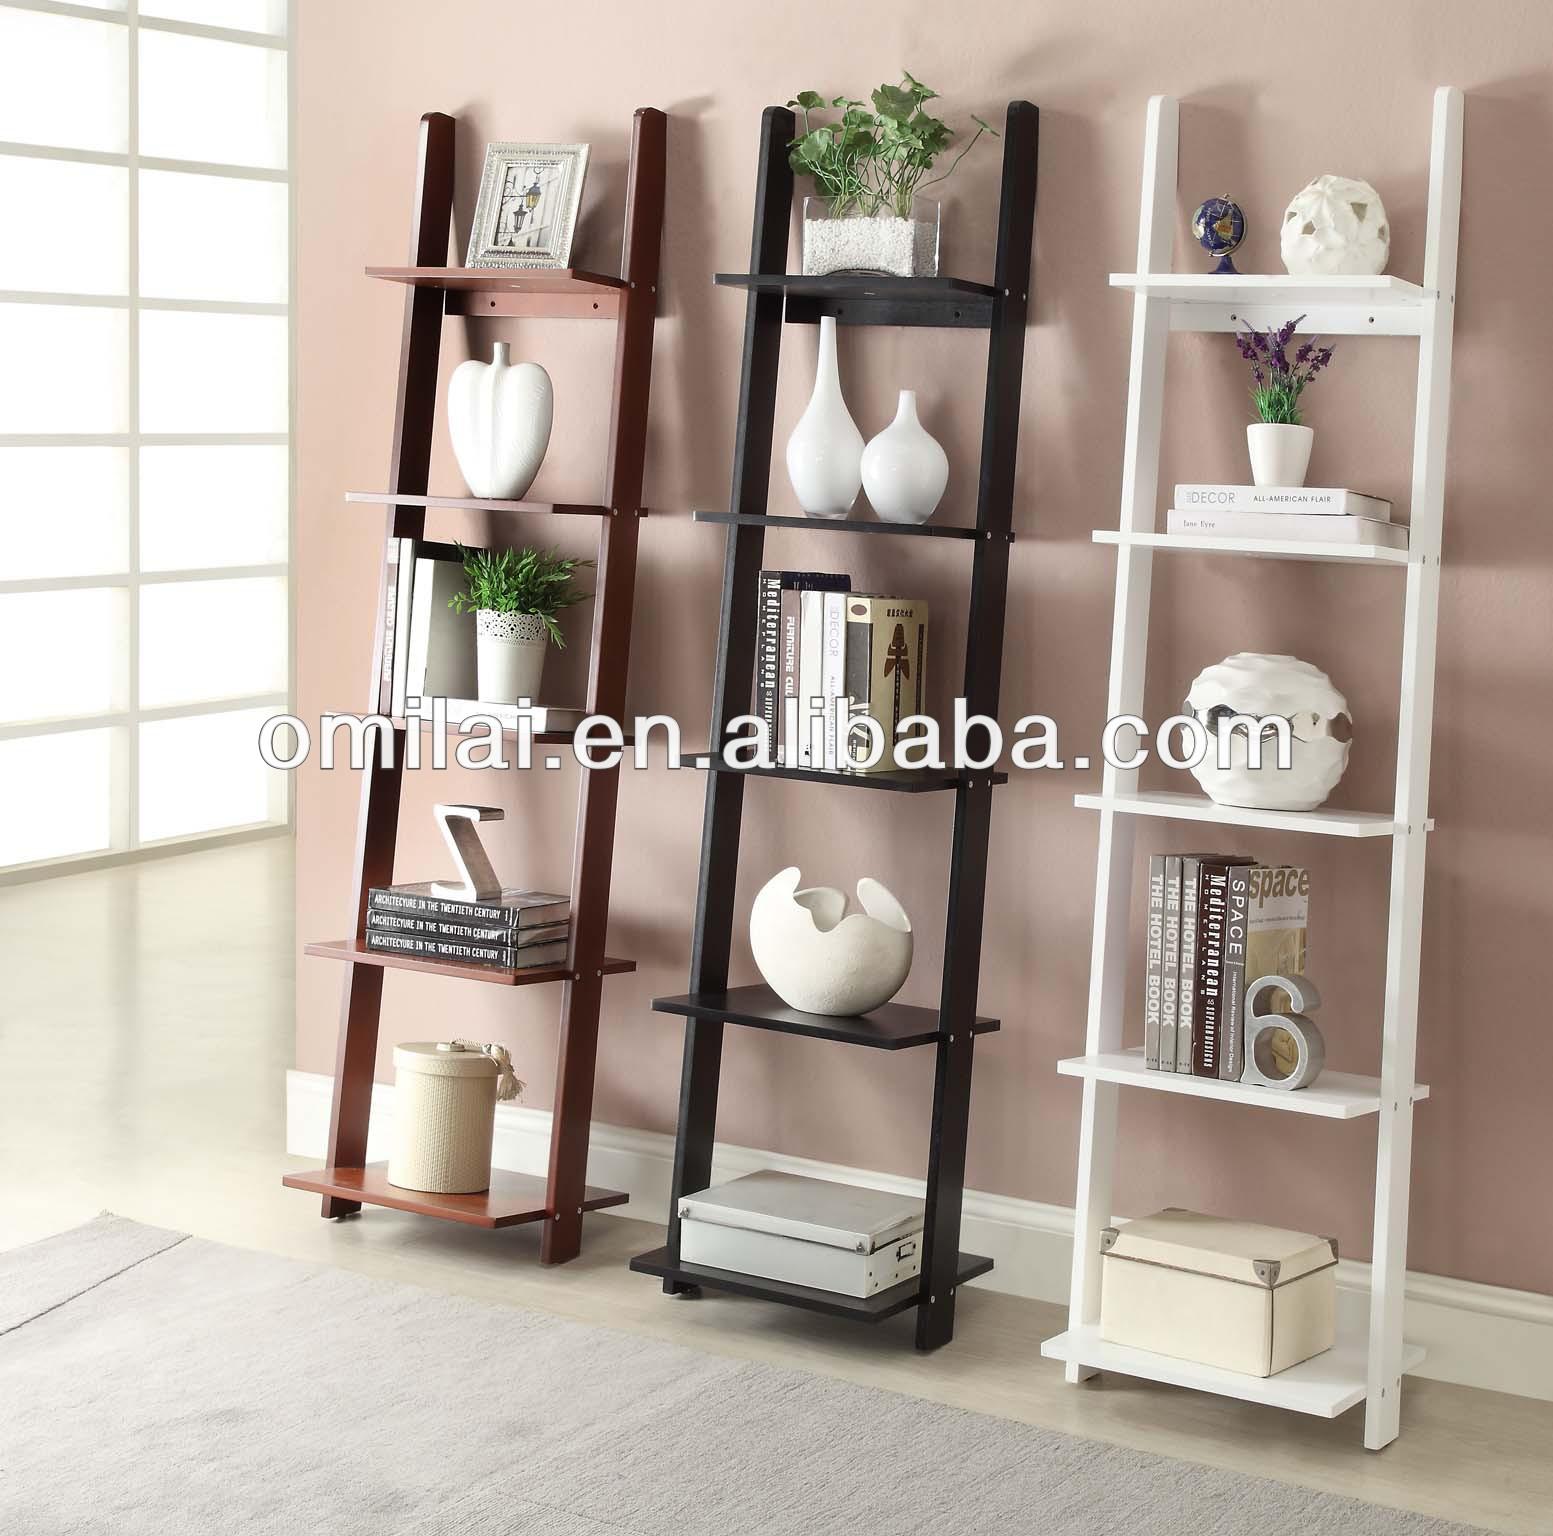 Estanter a de pared decorativos escalera en sala de estar for Estanteria de bano leroy merlin